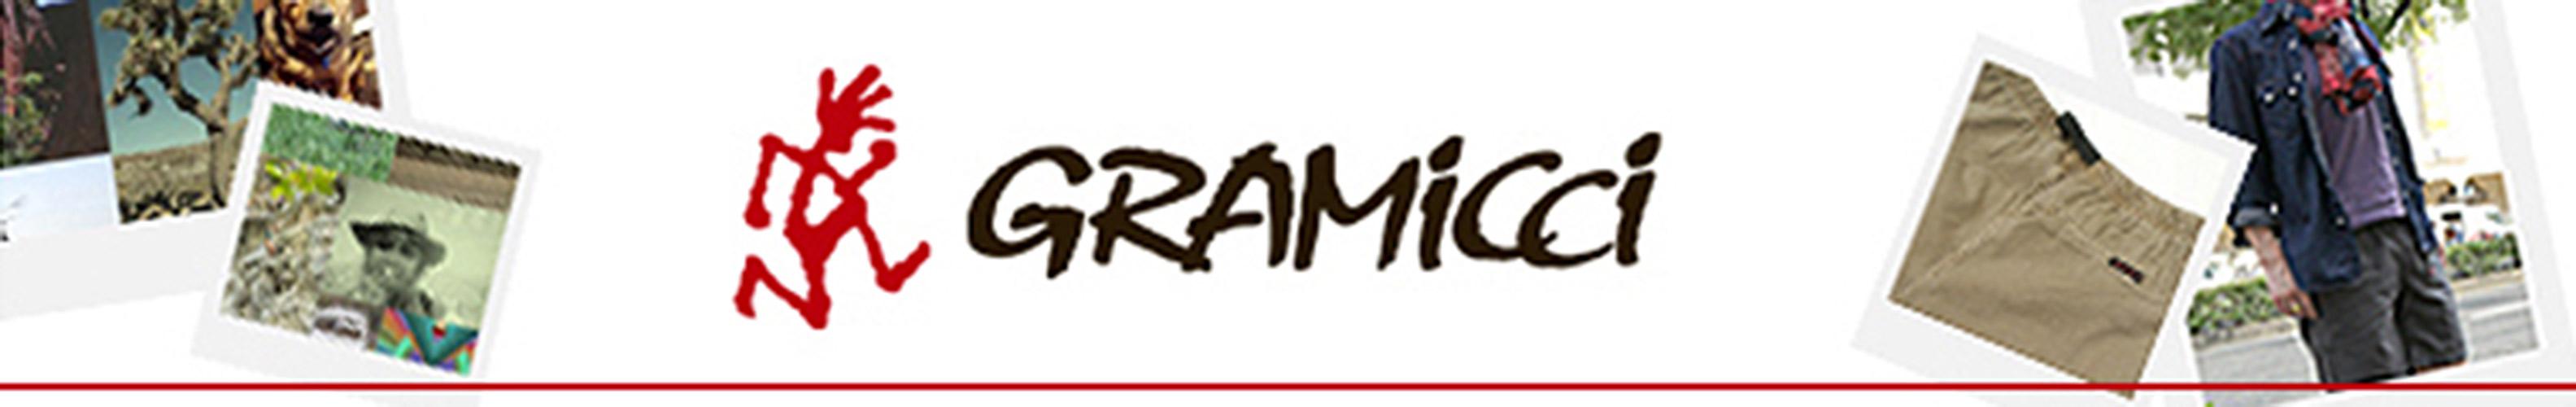 gramiccibannar